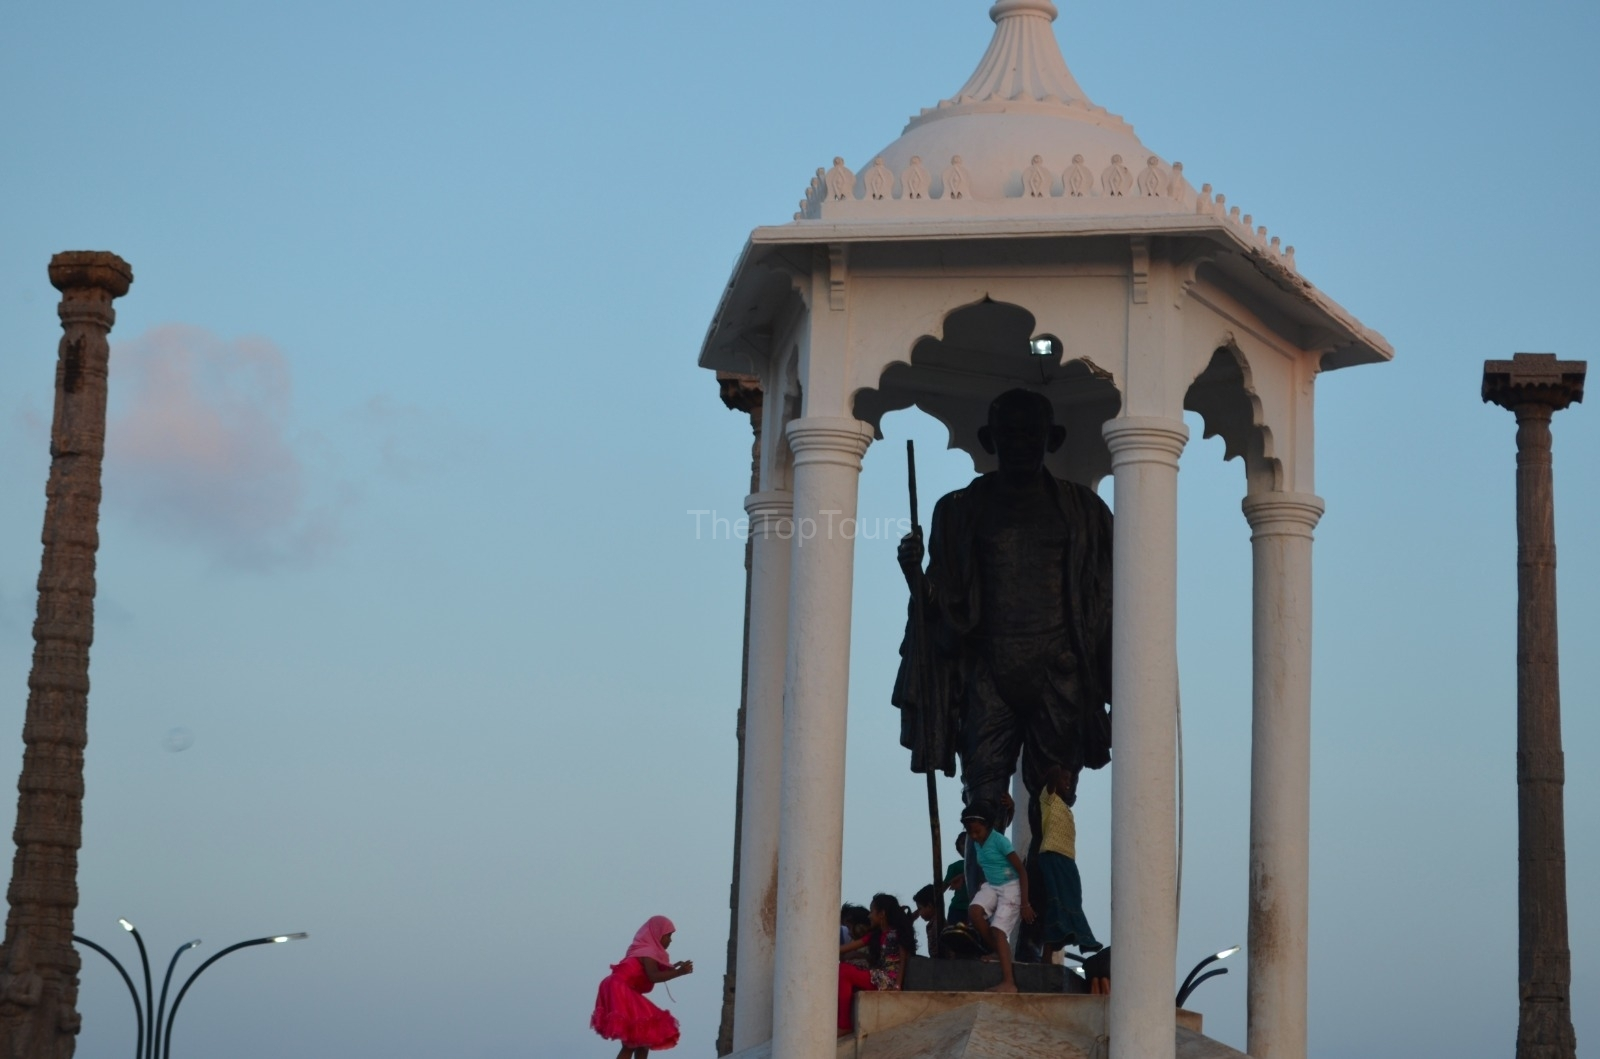 Visit Pudicherry Mahatma Gandhi Statue, Tamil Nadu